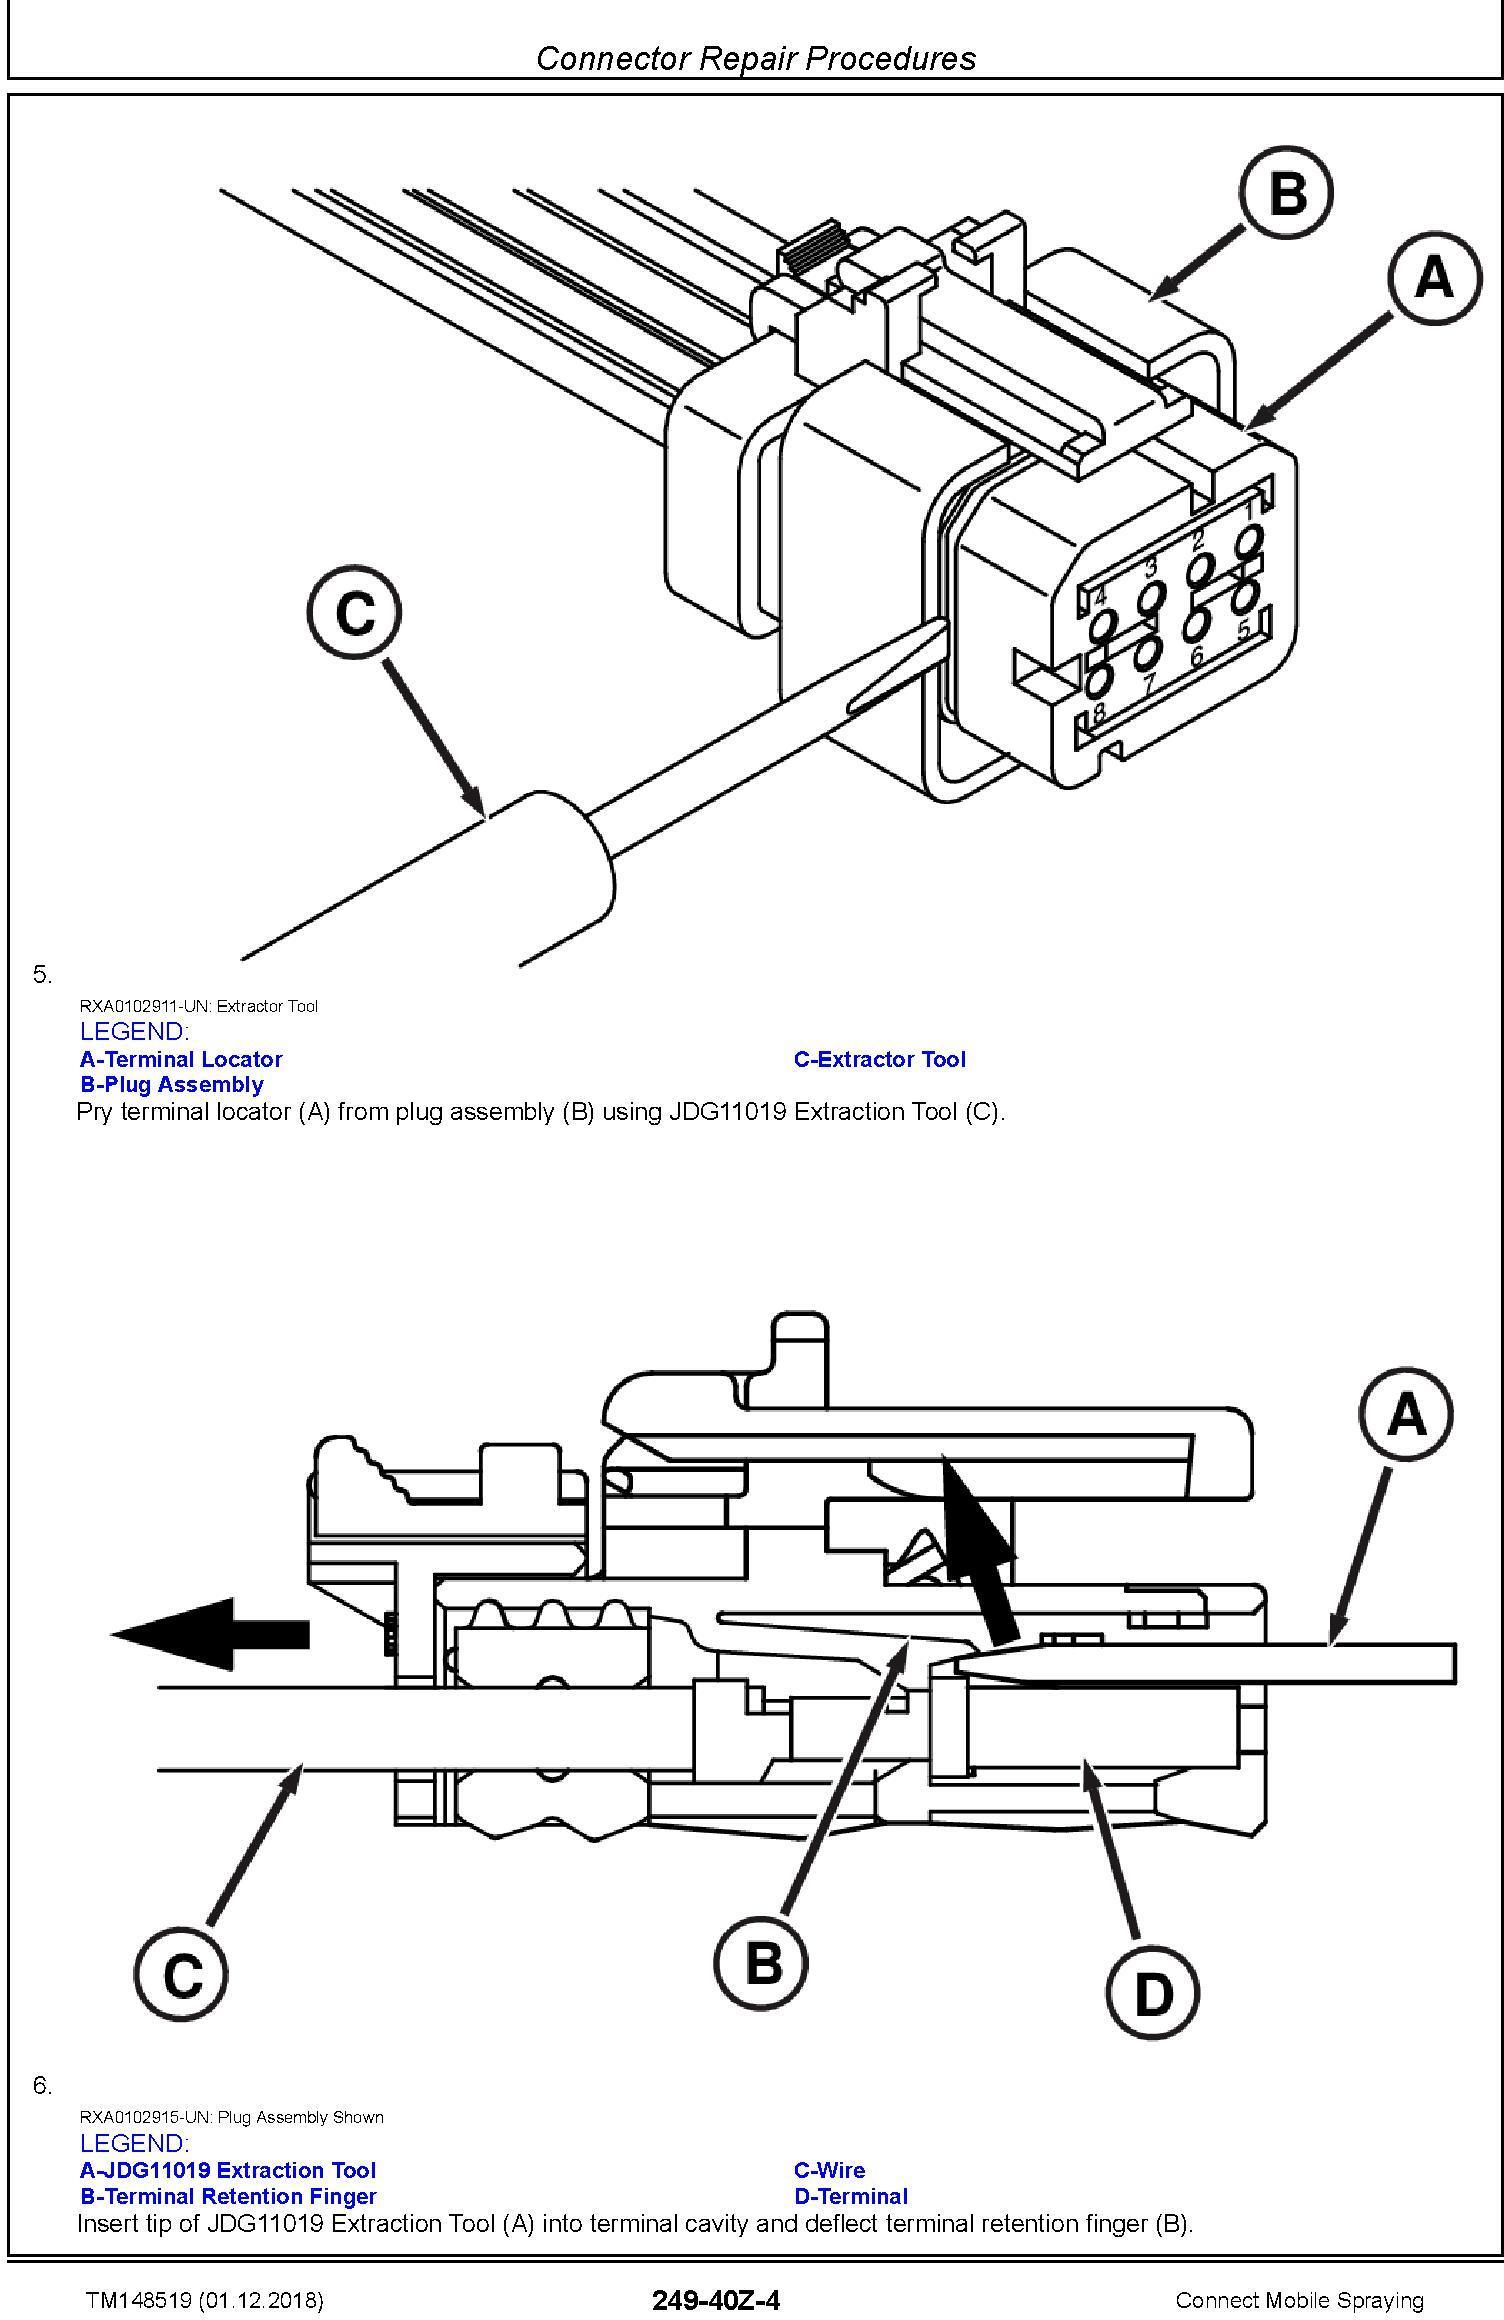 John Deere Connect Mobile Spraying Repair Technical Service Manual (TM148519) - 3